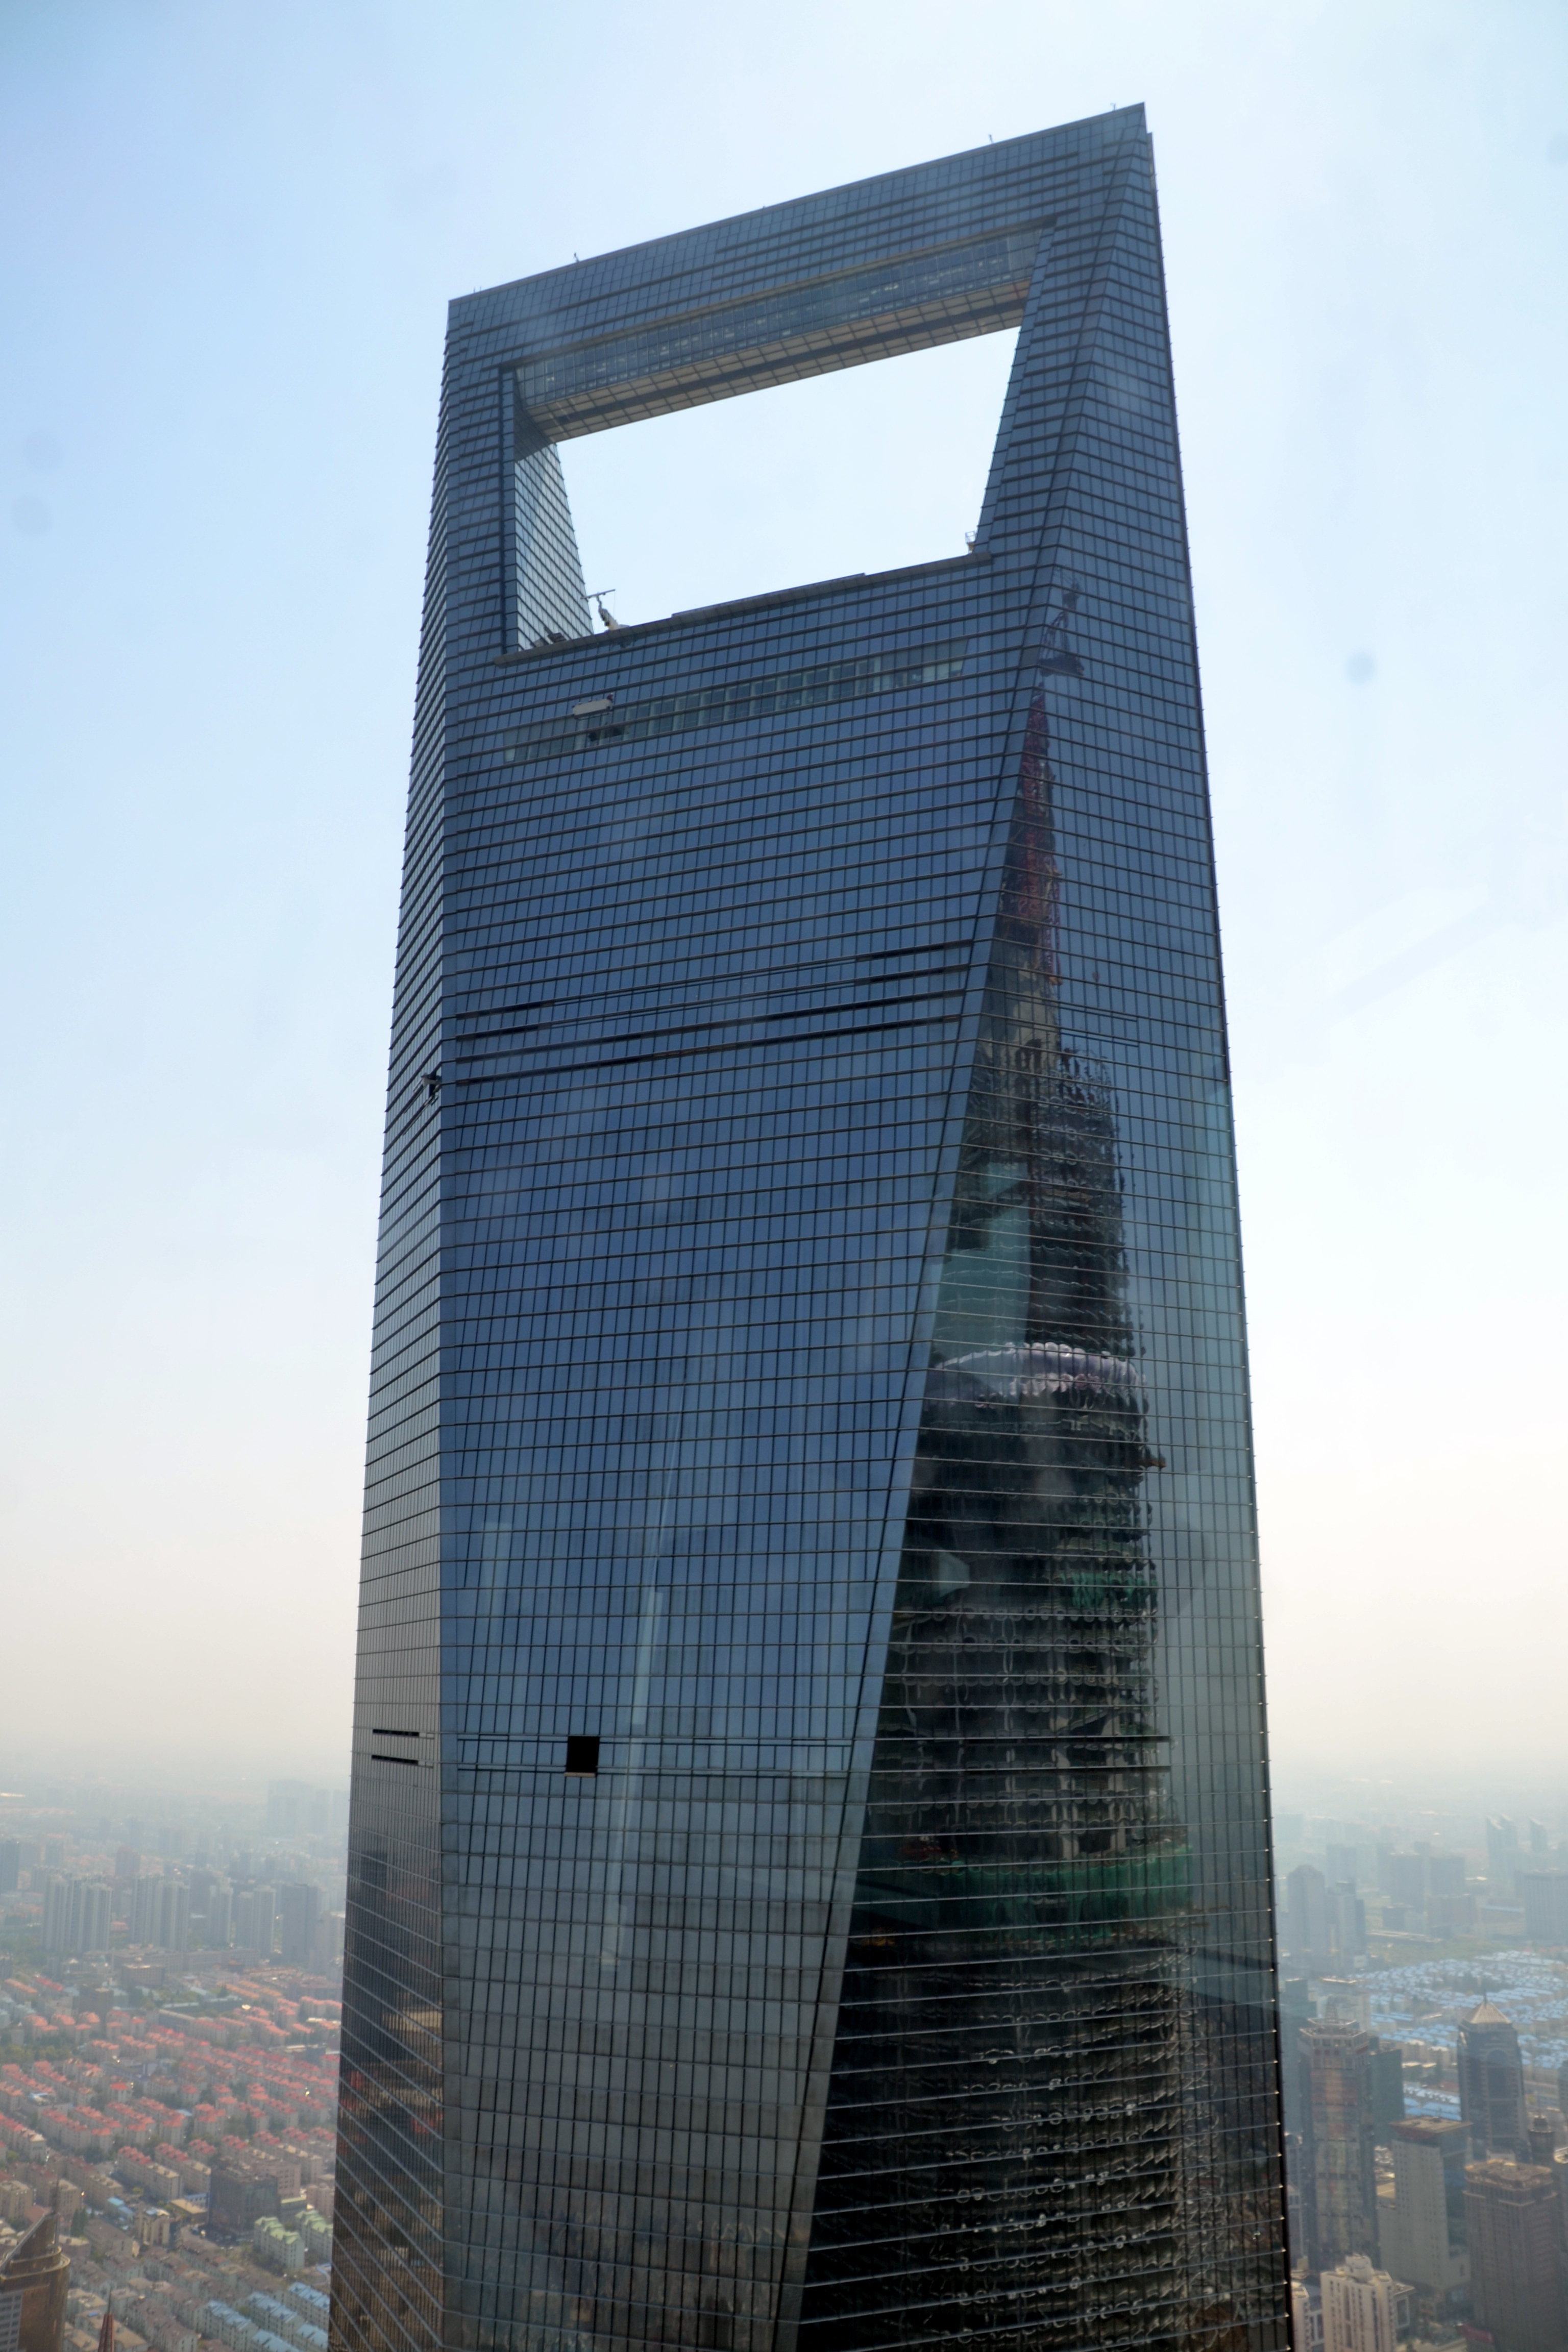 SWFC tower